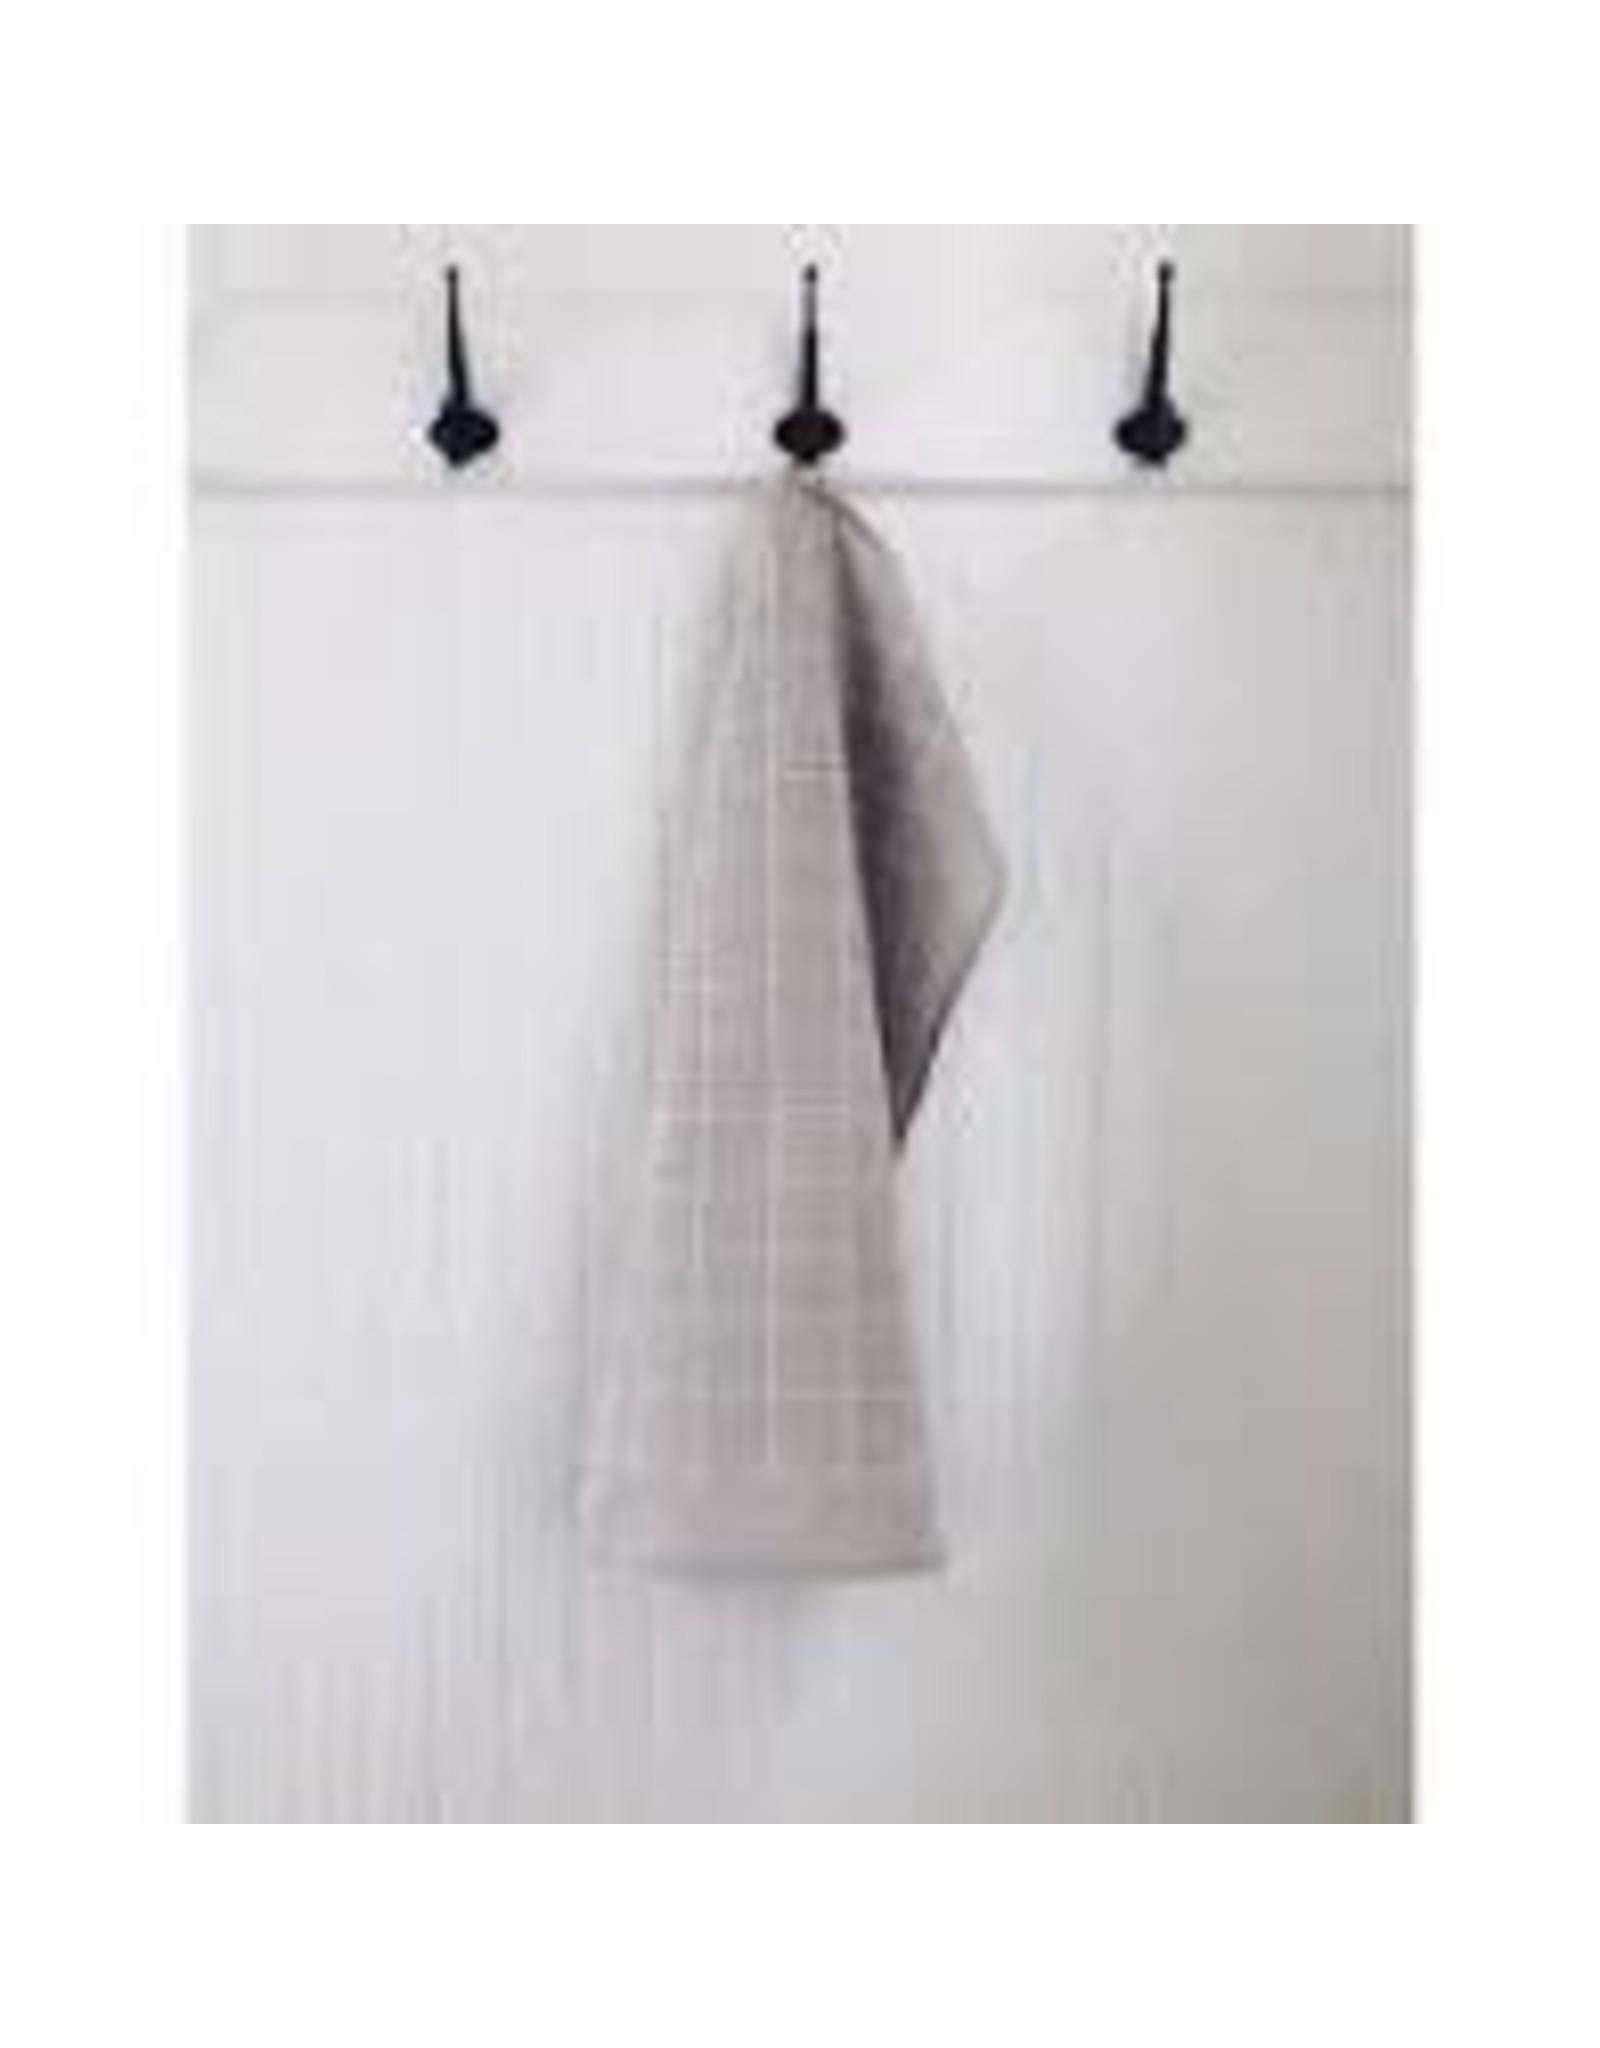 Ten & Co Tea Towel Grid (White on Warm Grey)